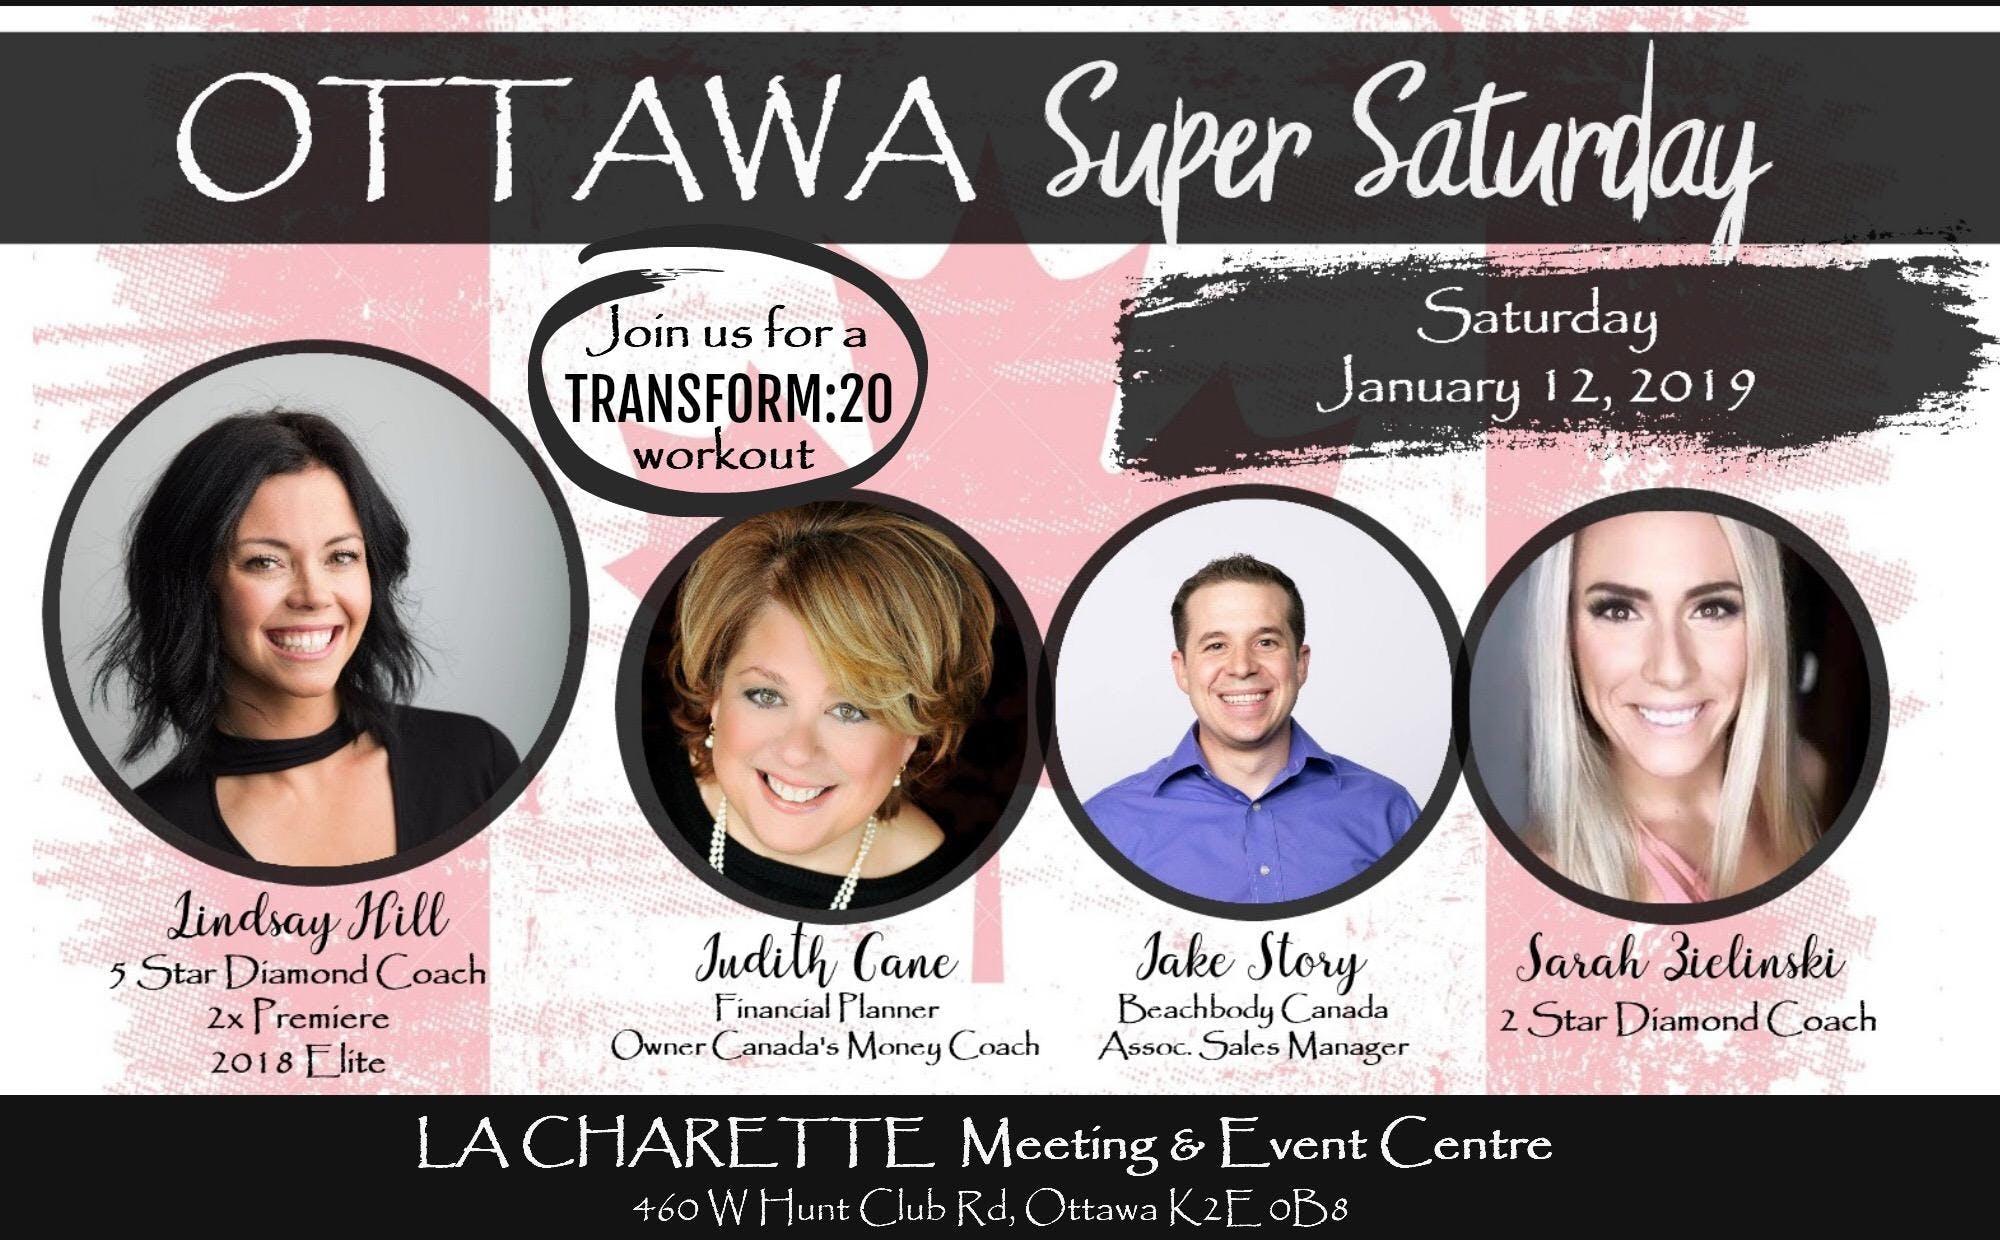 Ottawa Super Saturday - January 12, 2019